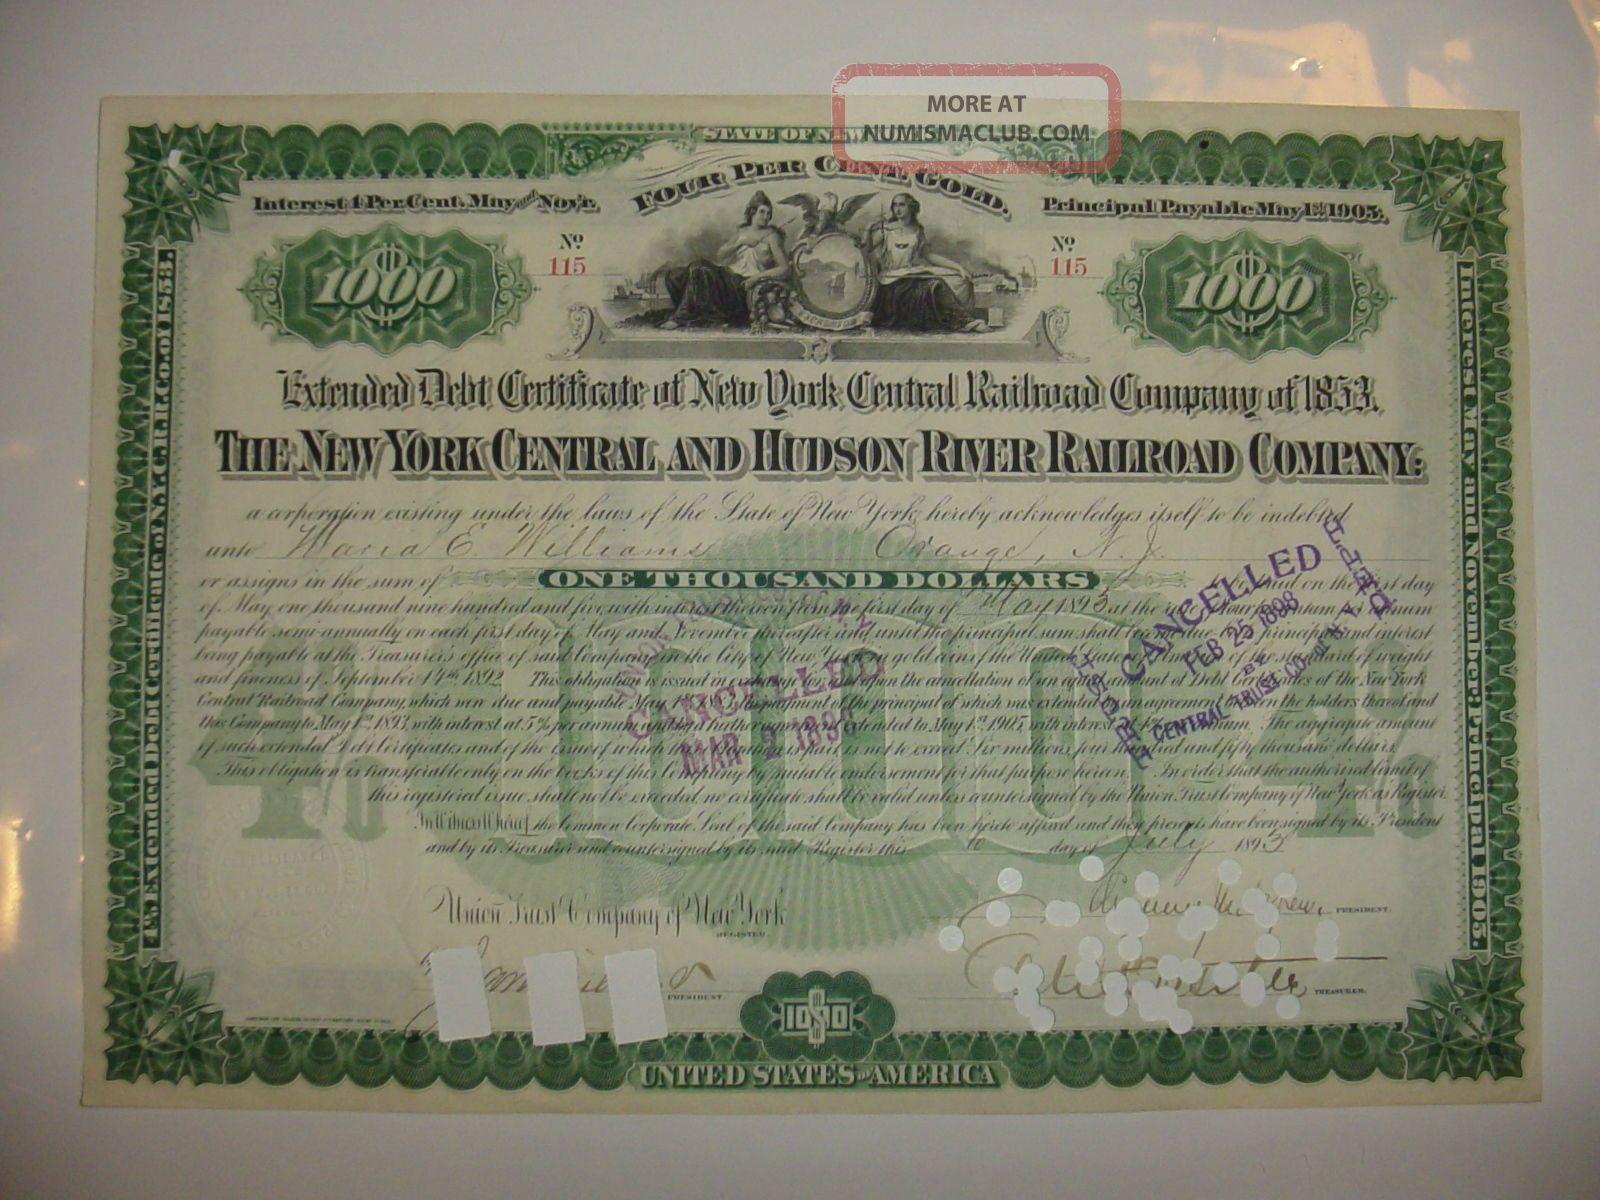 York Central & Hudson River Railroad Company Bond Stock Certificate Depew Transportation photo